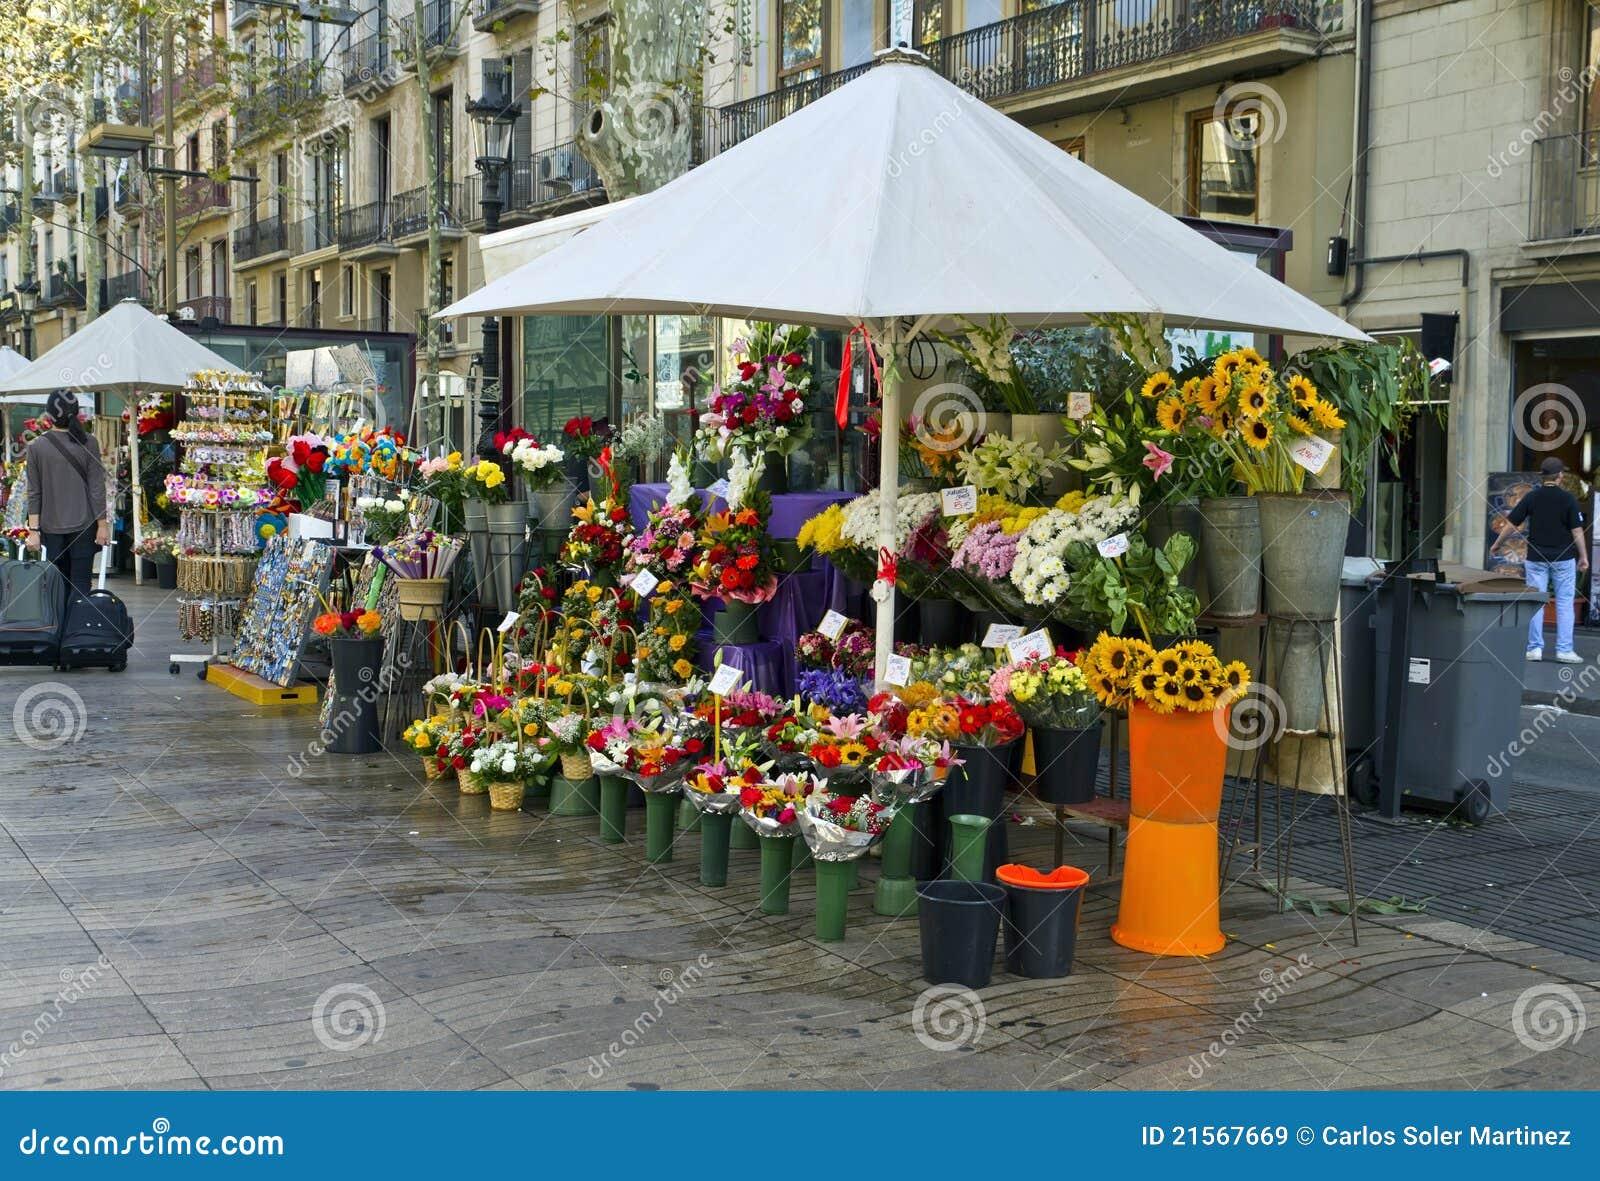 Barcelone Rambla Des Fleurs Images libres de droits - Image: 21567669